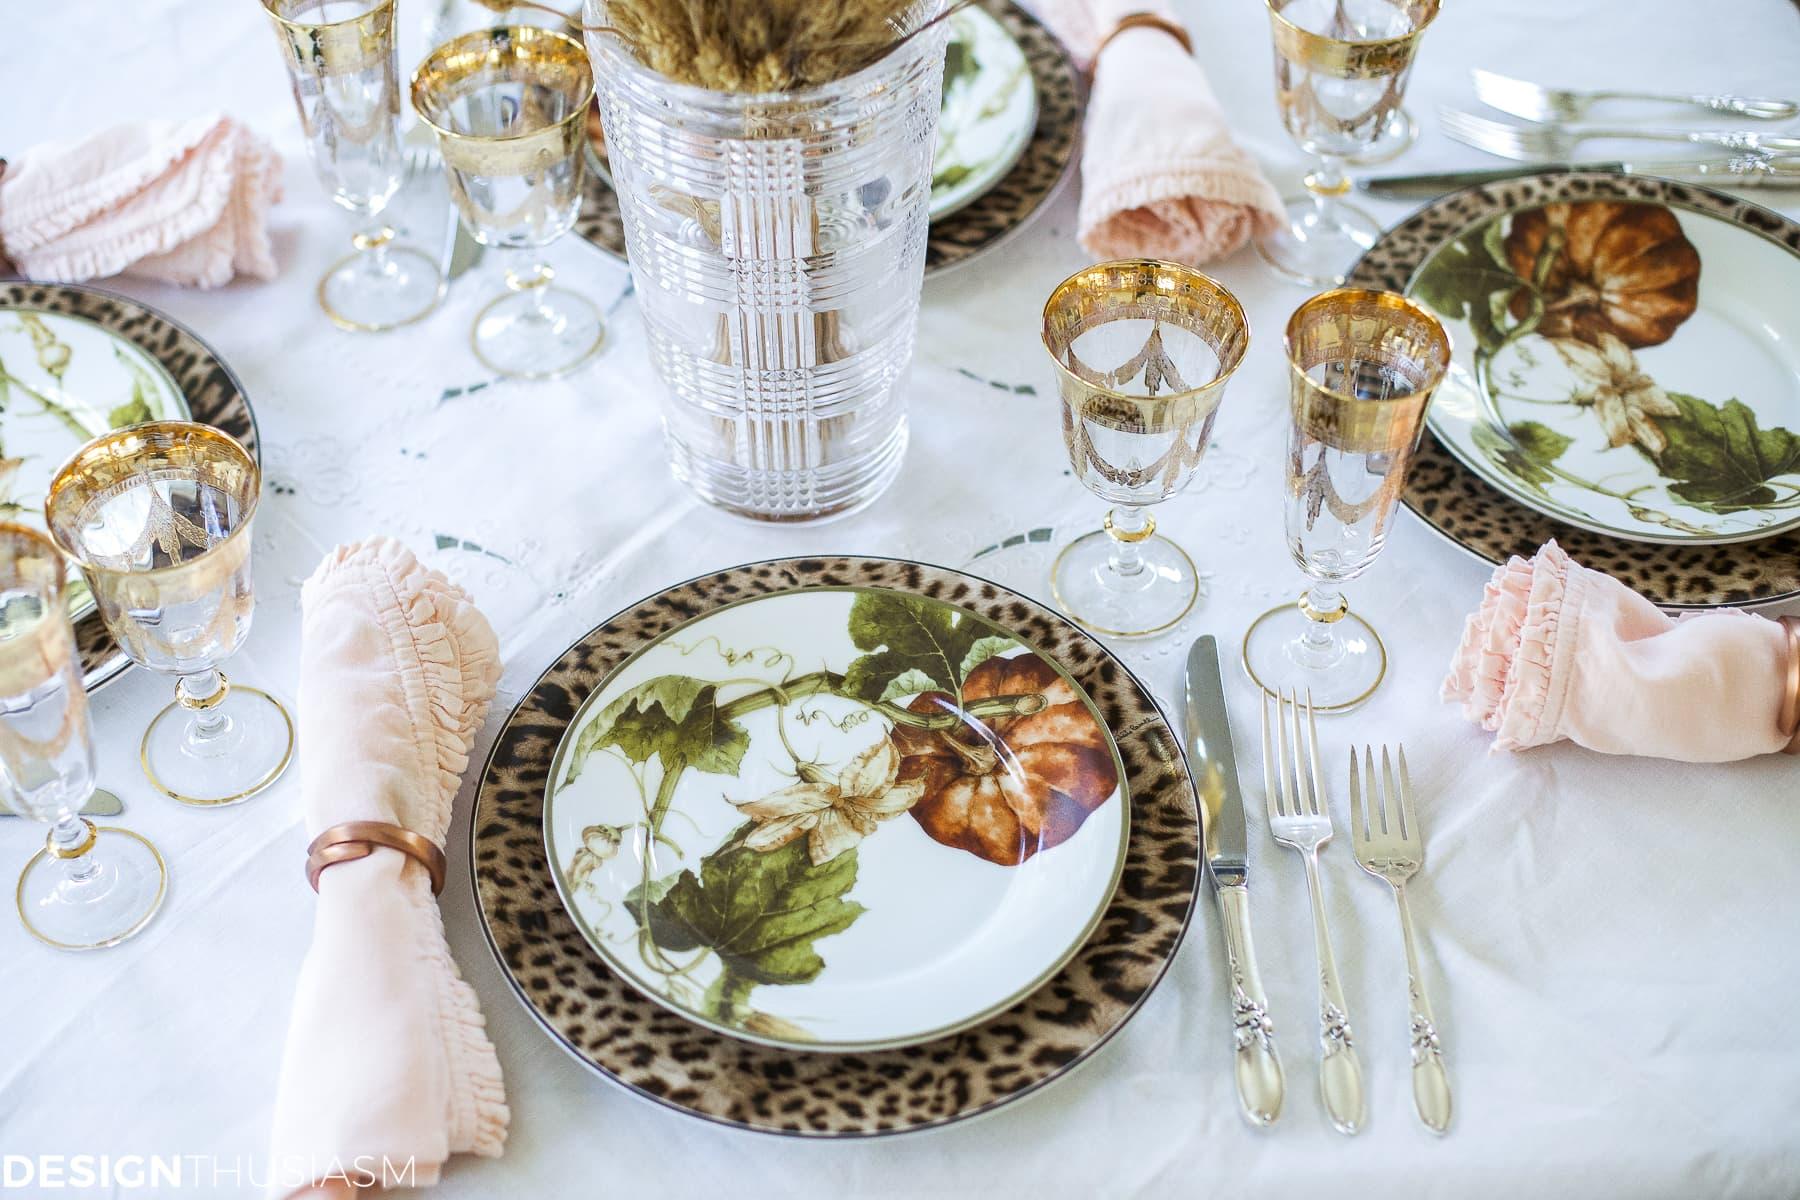 Add seasonal flavor with a fall wreath and garland - designthusiasm.com